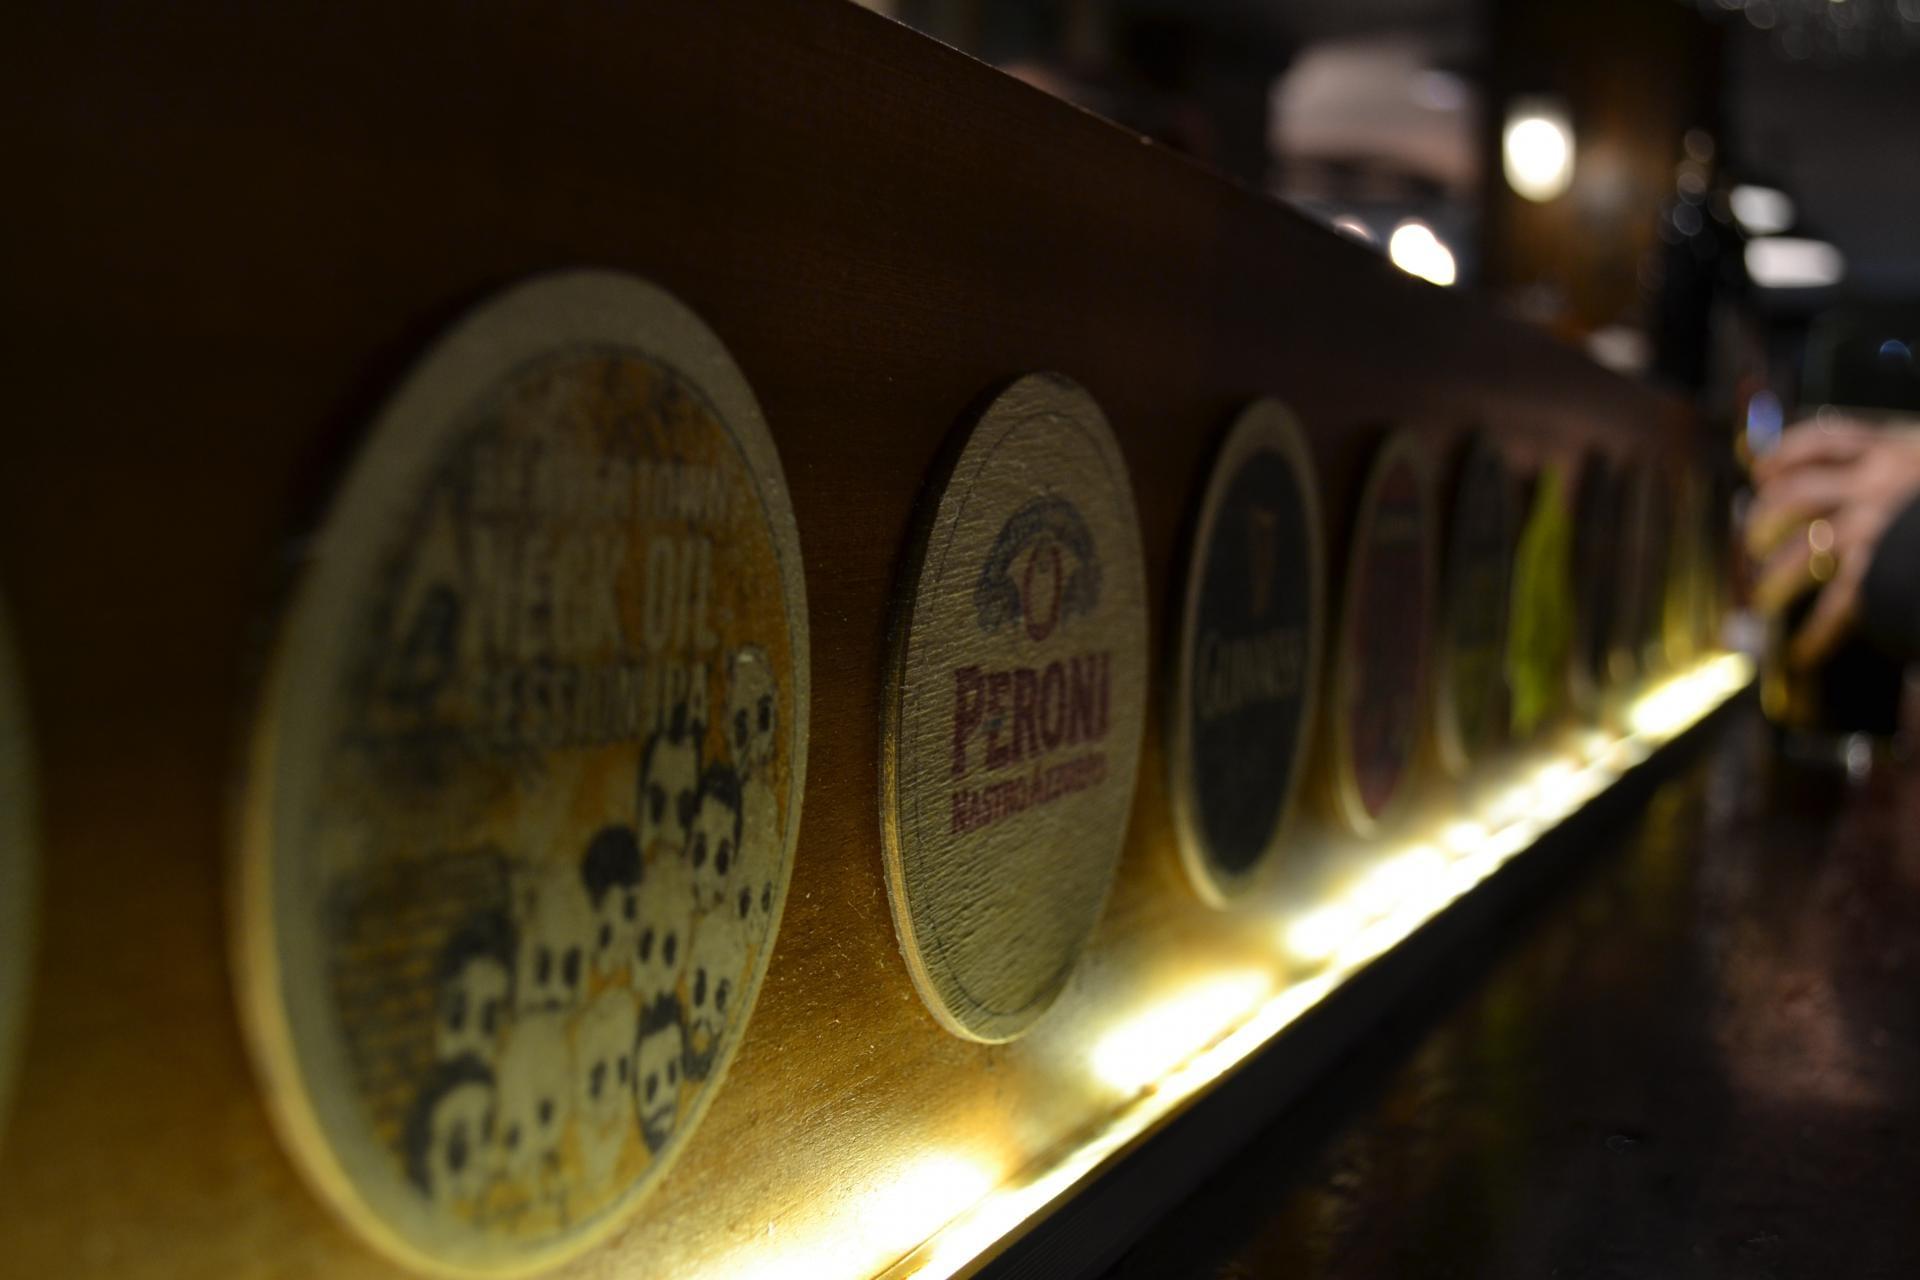 wheatsheaf-london-cerveza-170504181134007